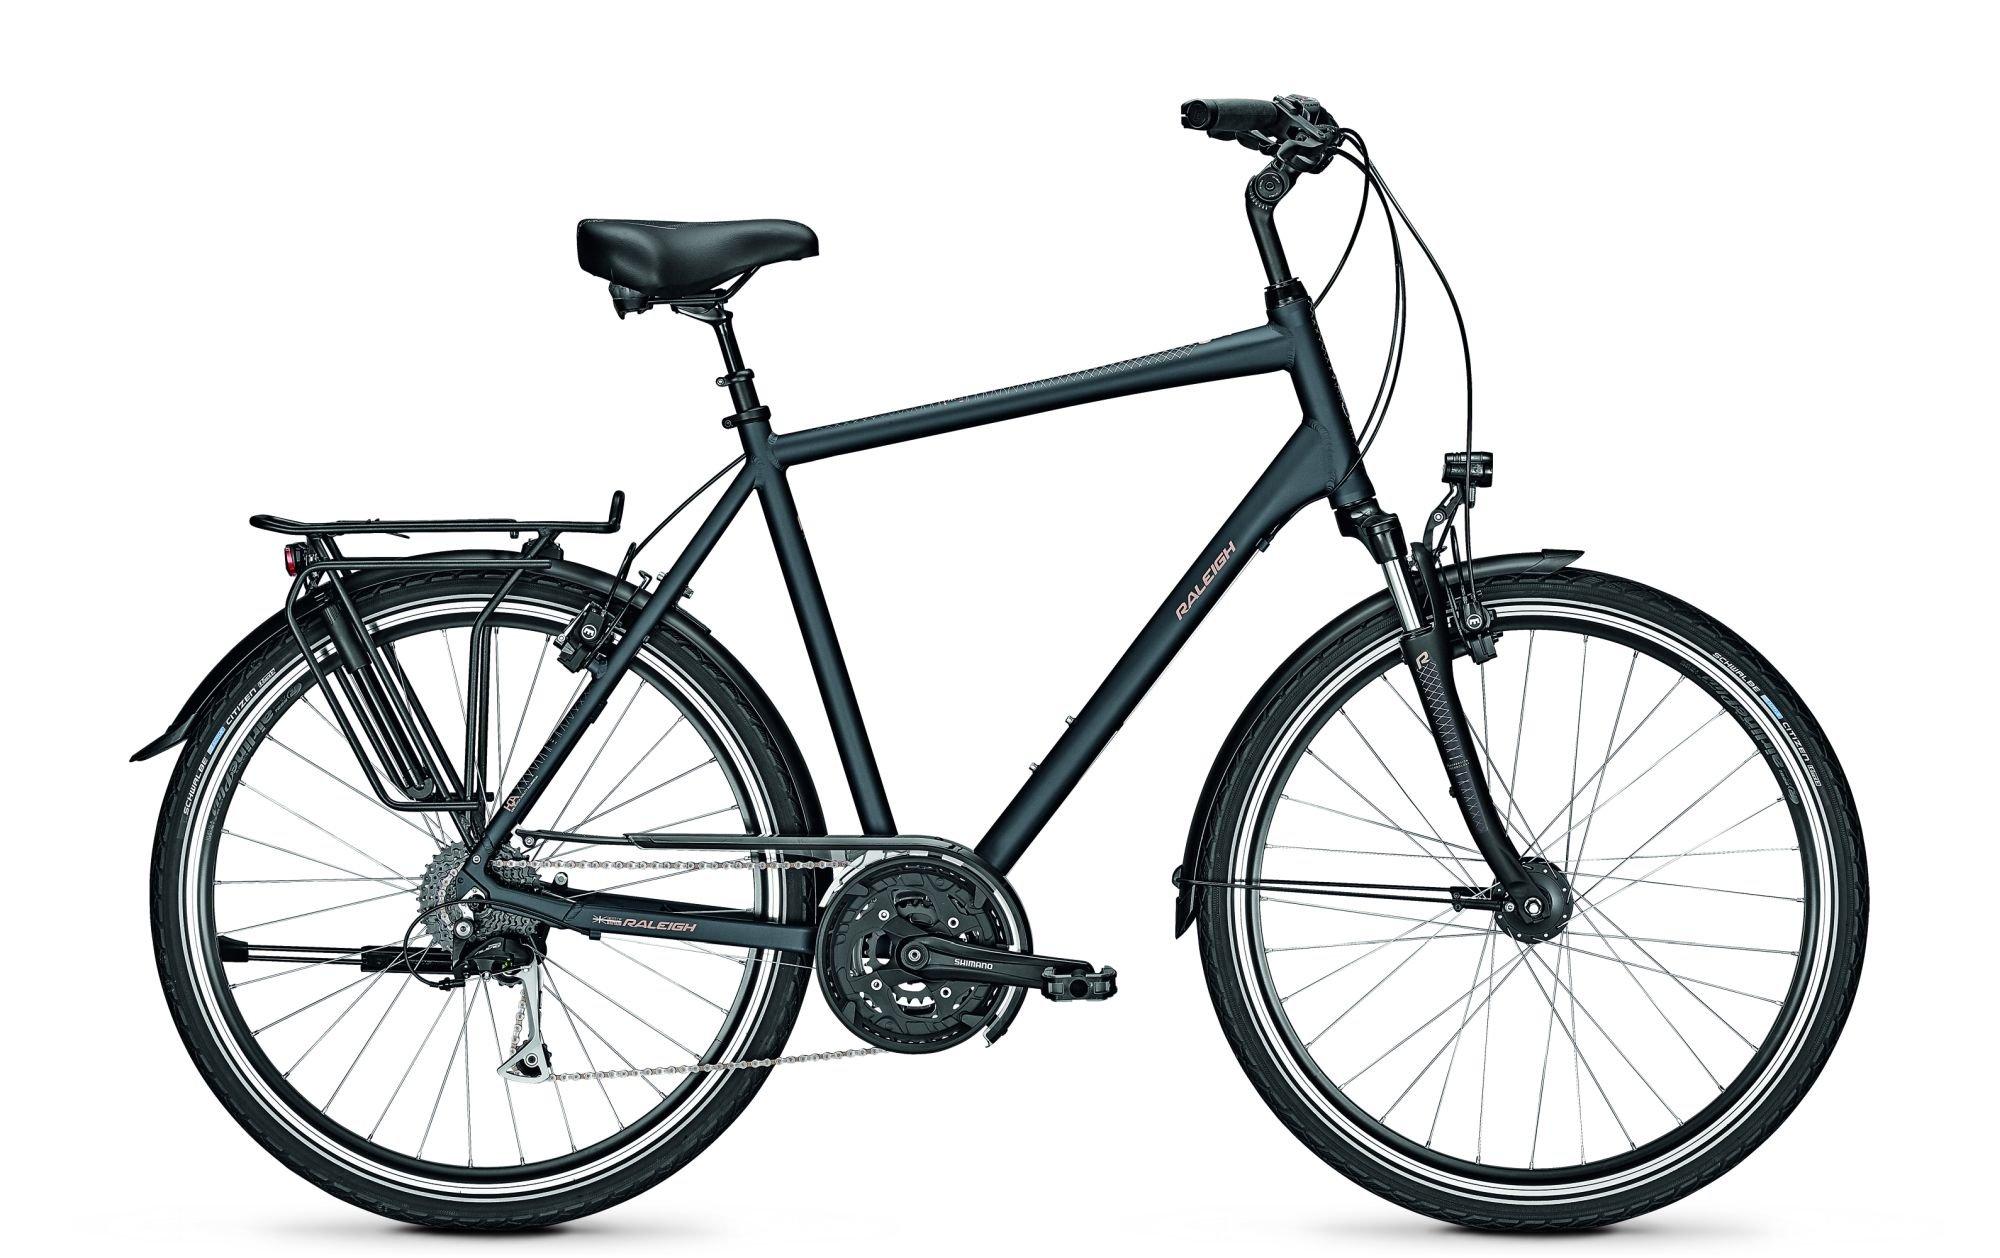 Fahrräder/Trekkingräder: Diamant  CHESTER 27 XXL 27 Gang Kettenschaltung Herrenfahrrad Diamant Modell 2020 28 Zoll 70 cm